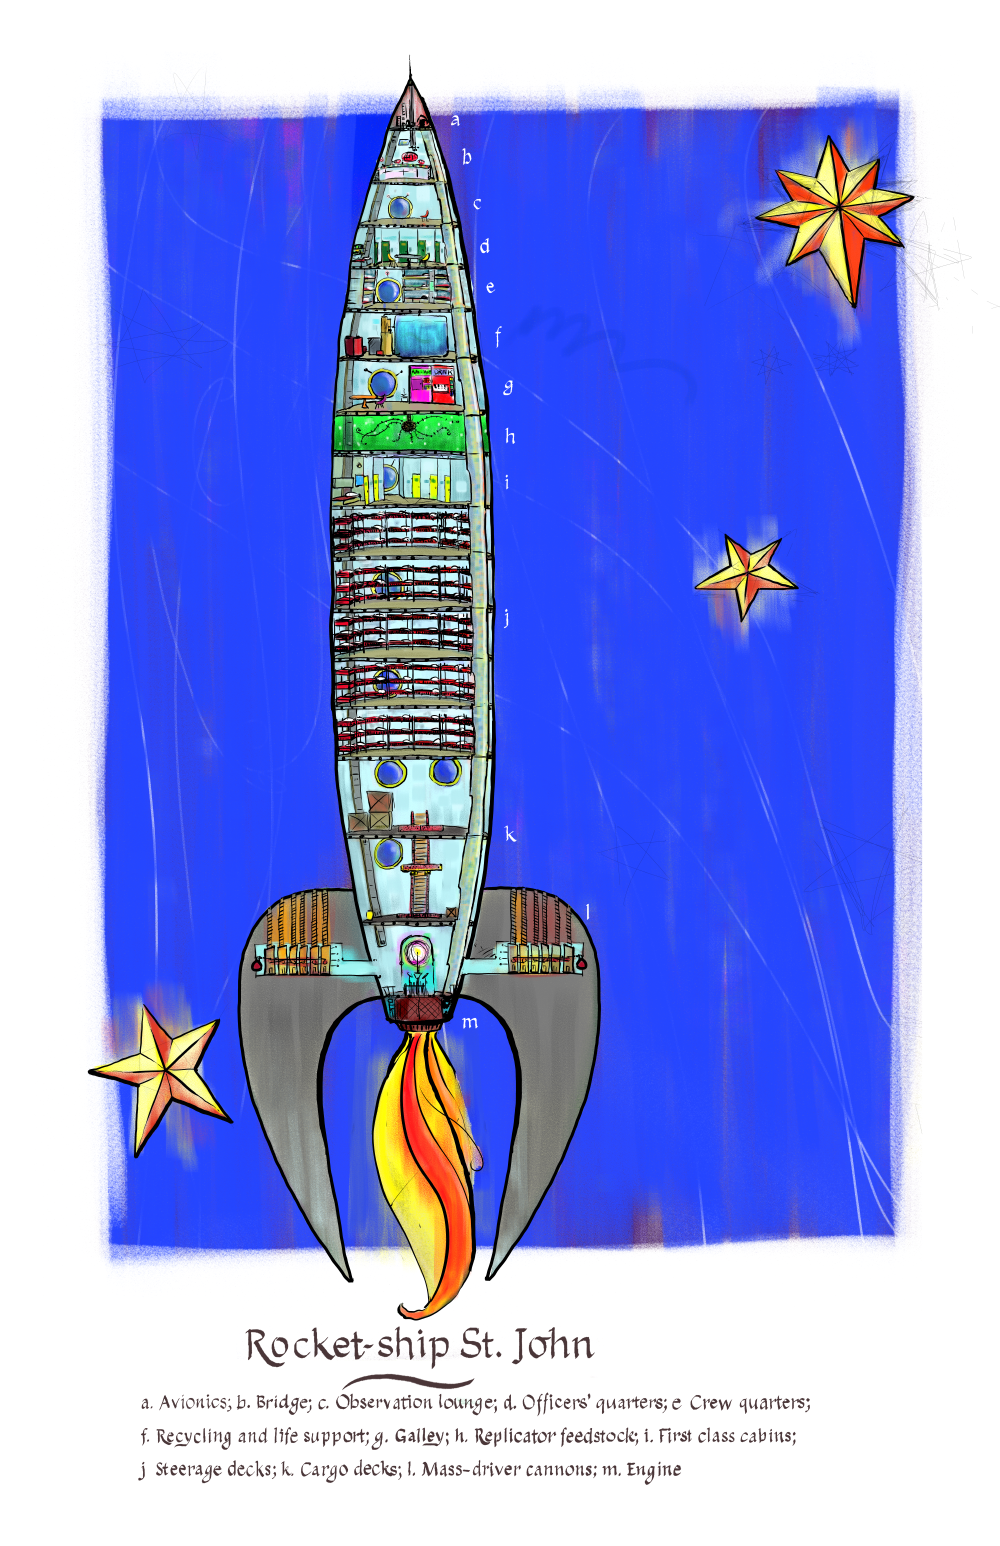 Rocket ship St. John cutaway